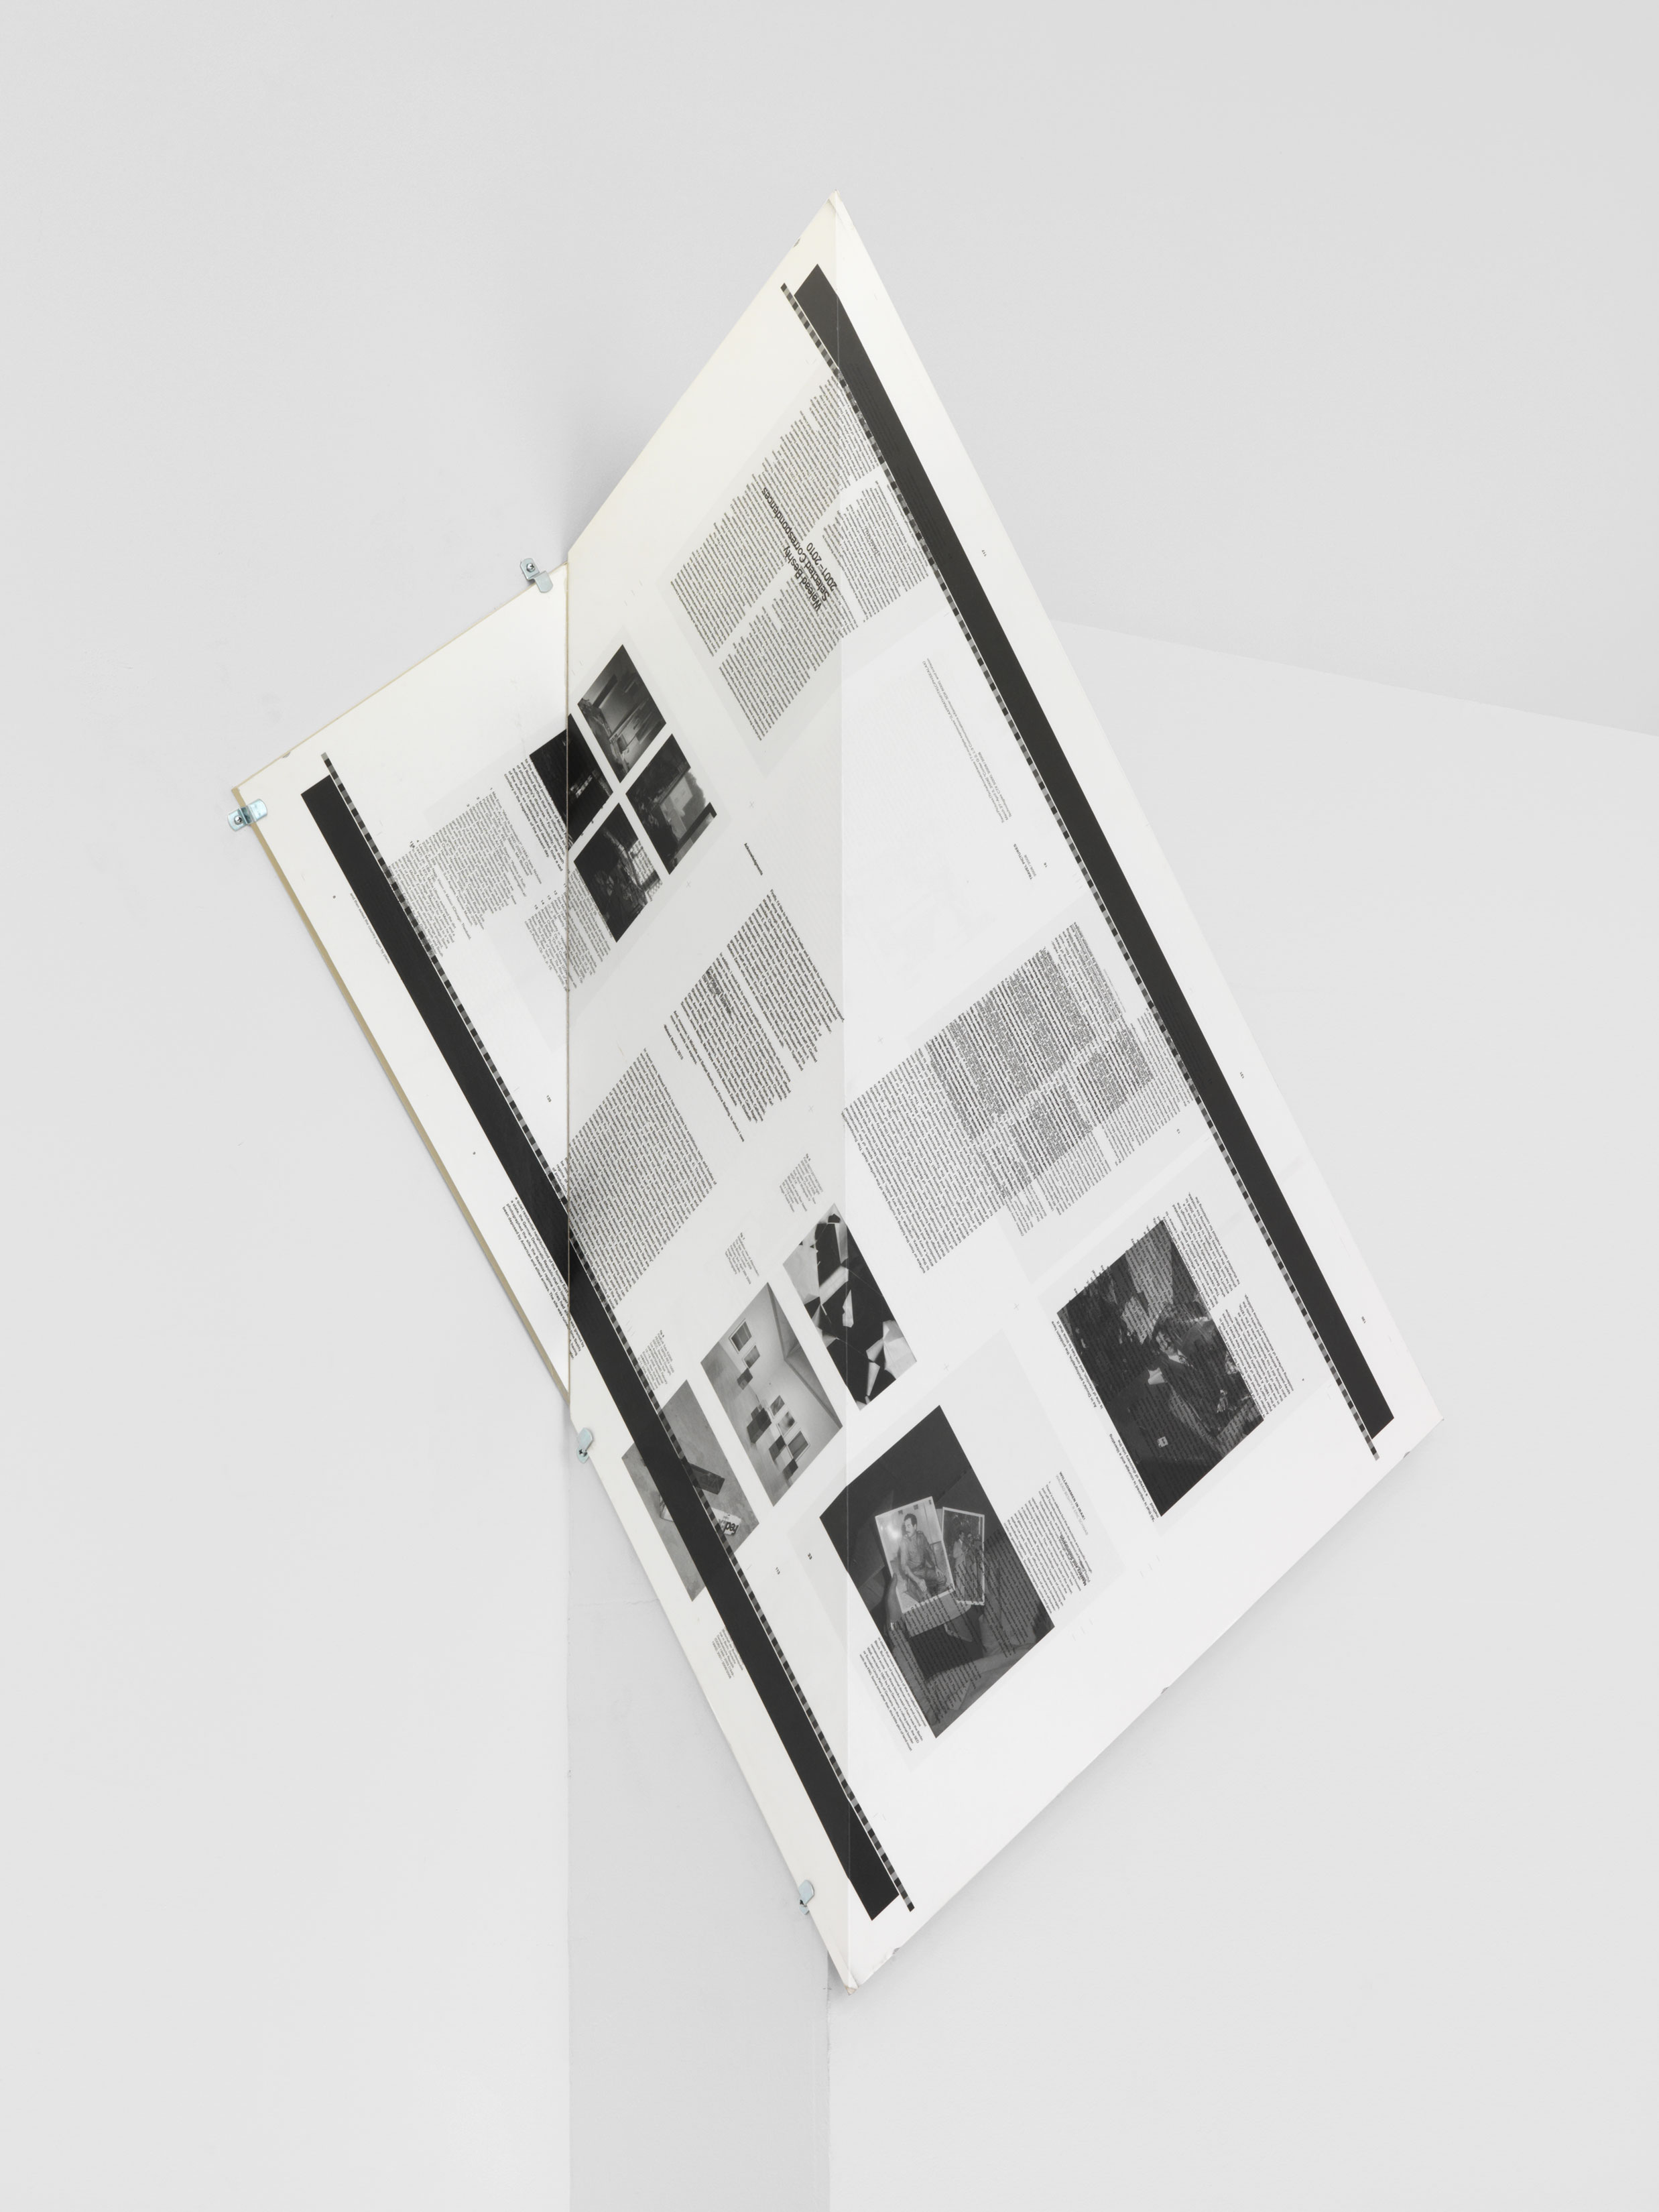 Make-Ready 1: Uncut Signature [Walead Beshty: Selected Correspondences 2001–2010, Bologna: Damiani Editore, 2010, Grafiche Damiani, Bologna, Italy, July 4–6, 2010], 90º Bend, 30º Diagonal / 150º Antidiagonal Bisection and 150º Diagonal / 30º Antidiagonal Bisection    2016   Four-color offset on coated paper, bent plexiglass  28 1/2 x 12 x 40 1/2 inches   Make Readies, 2010–